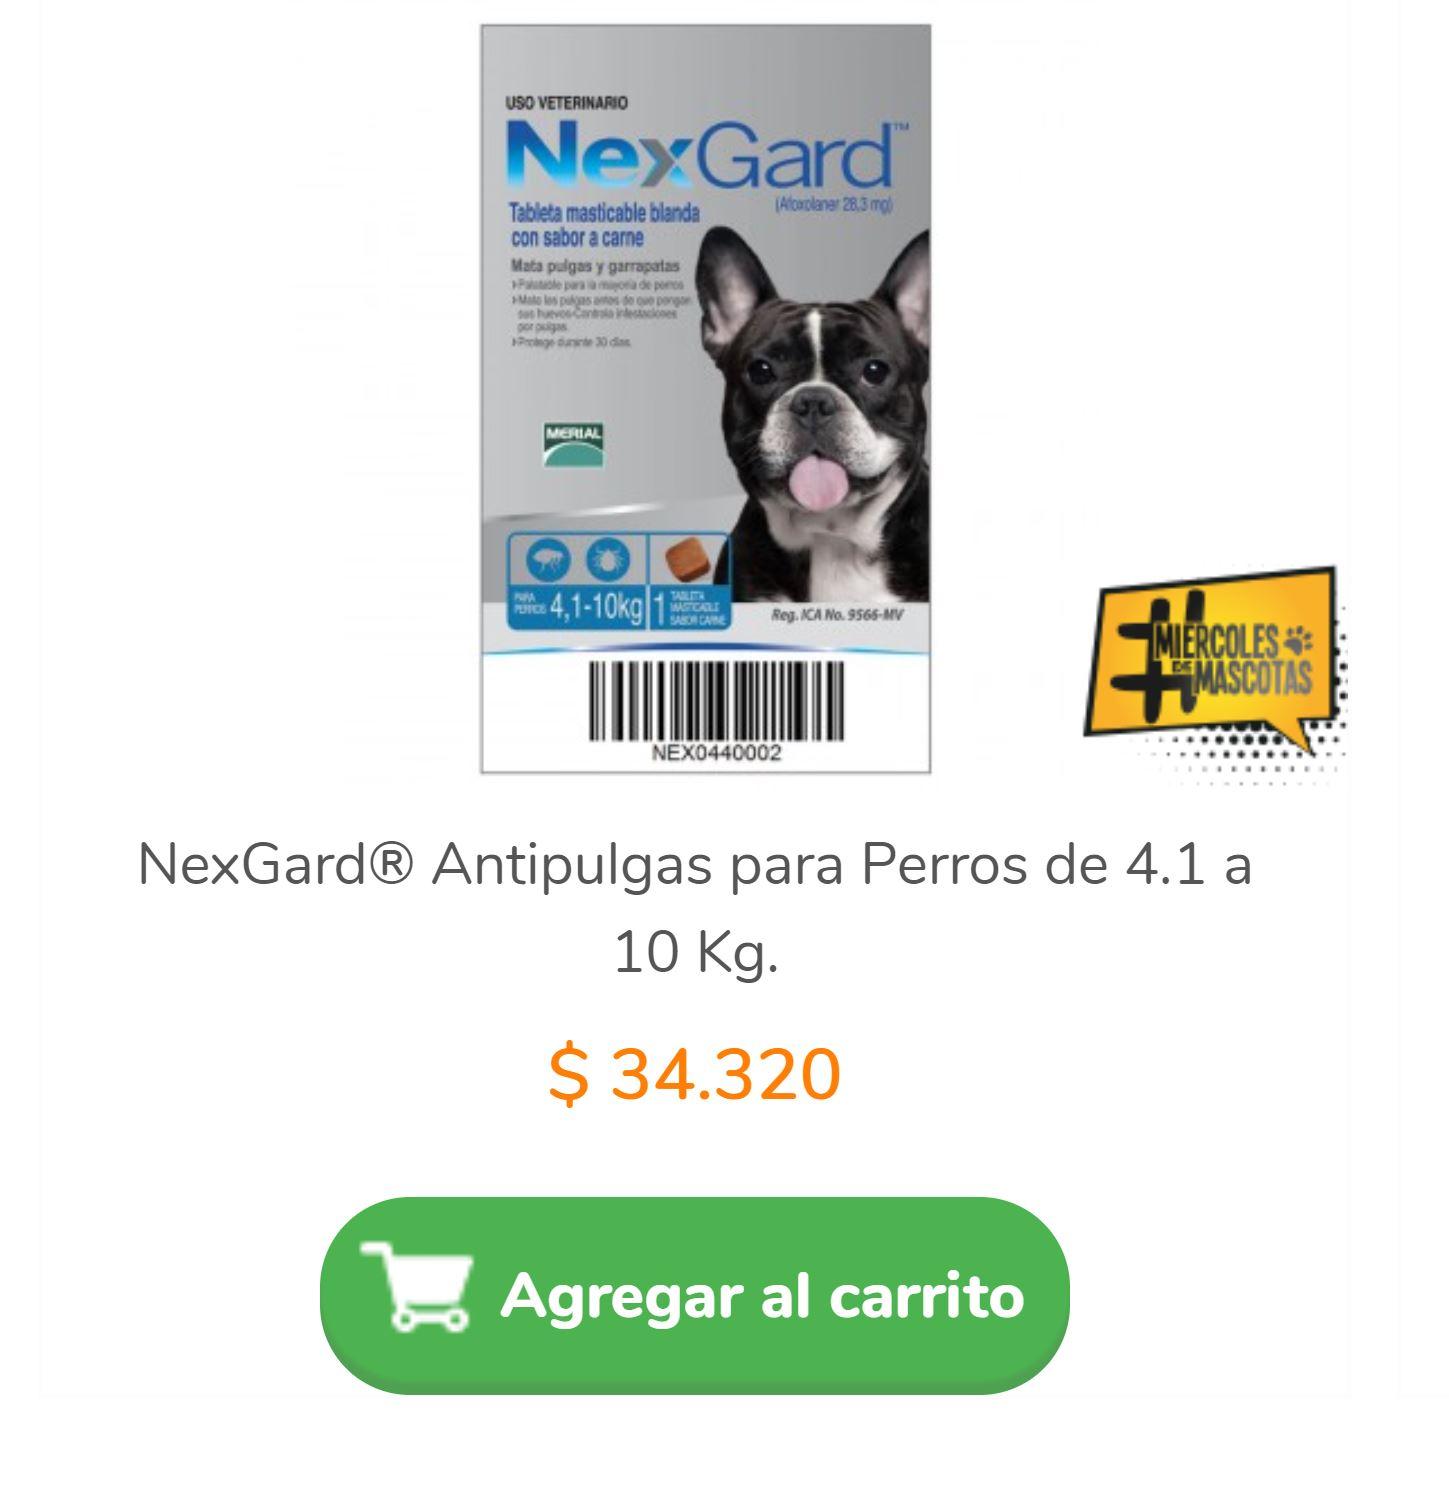 nexgard - 1